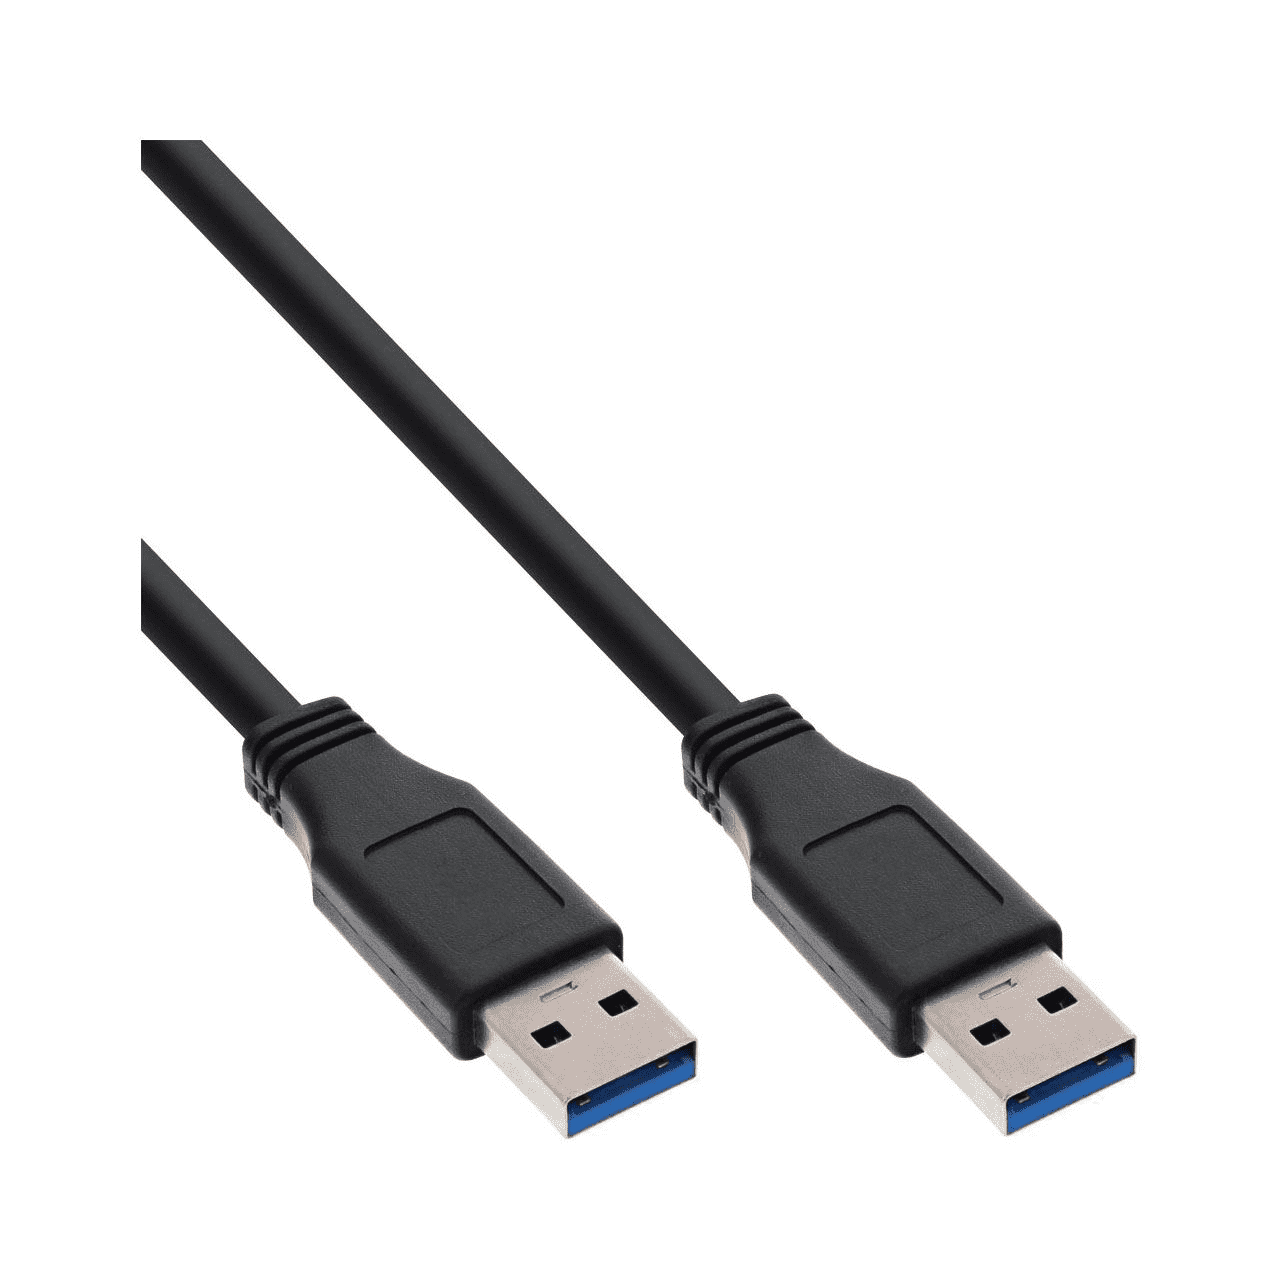 InLine USB 3.0 Kabel 35330